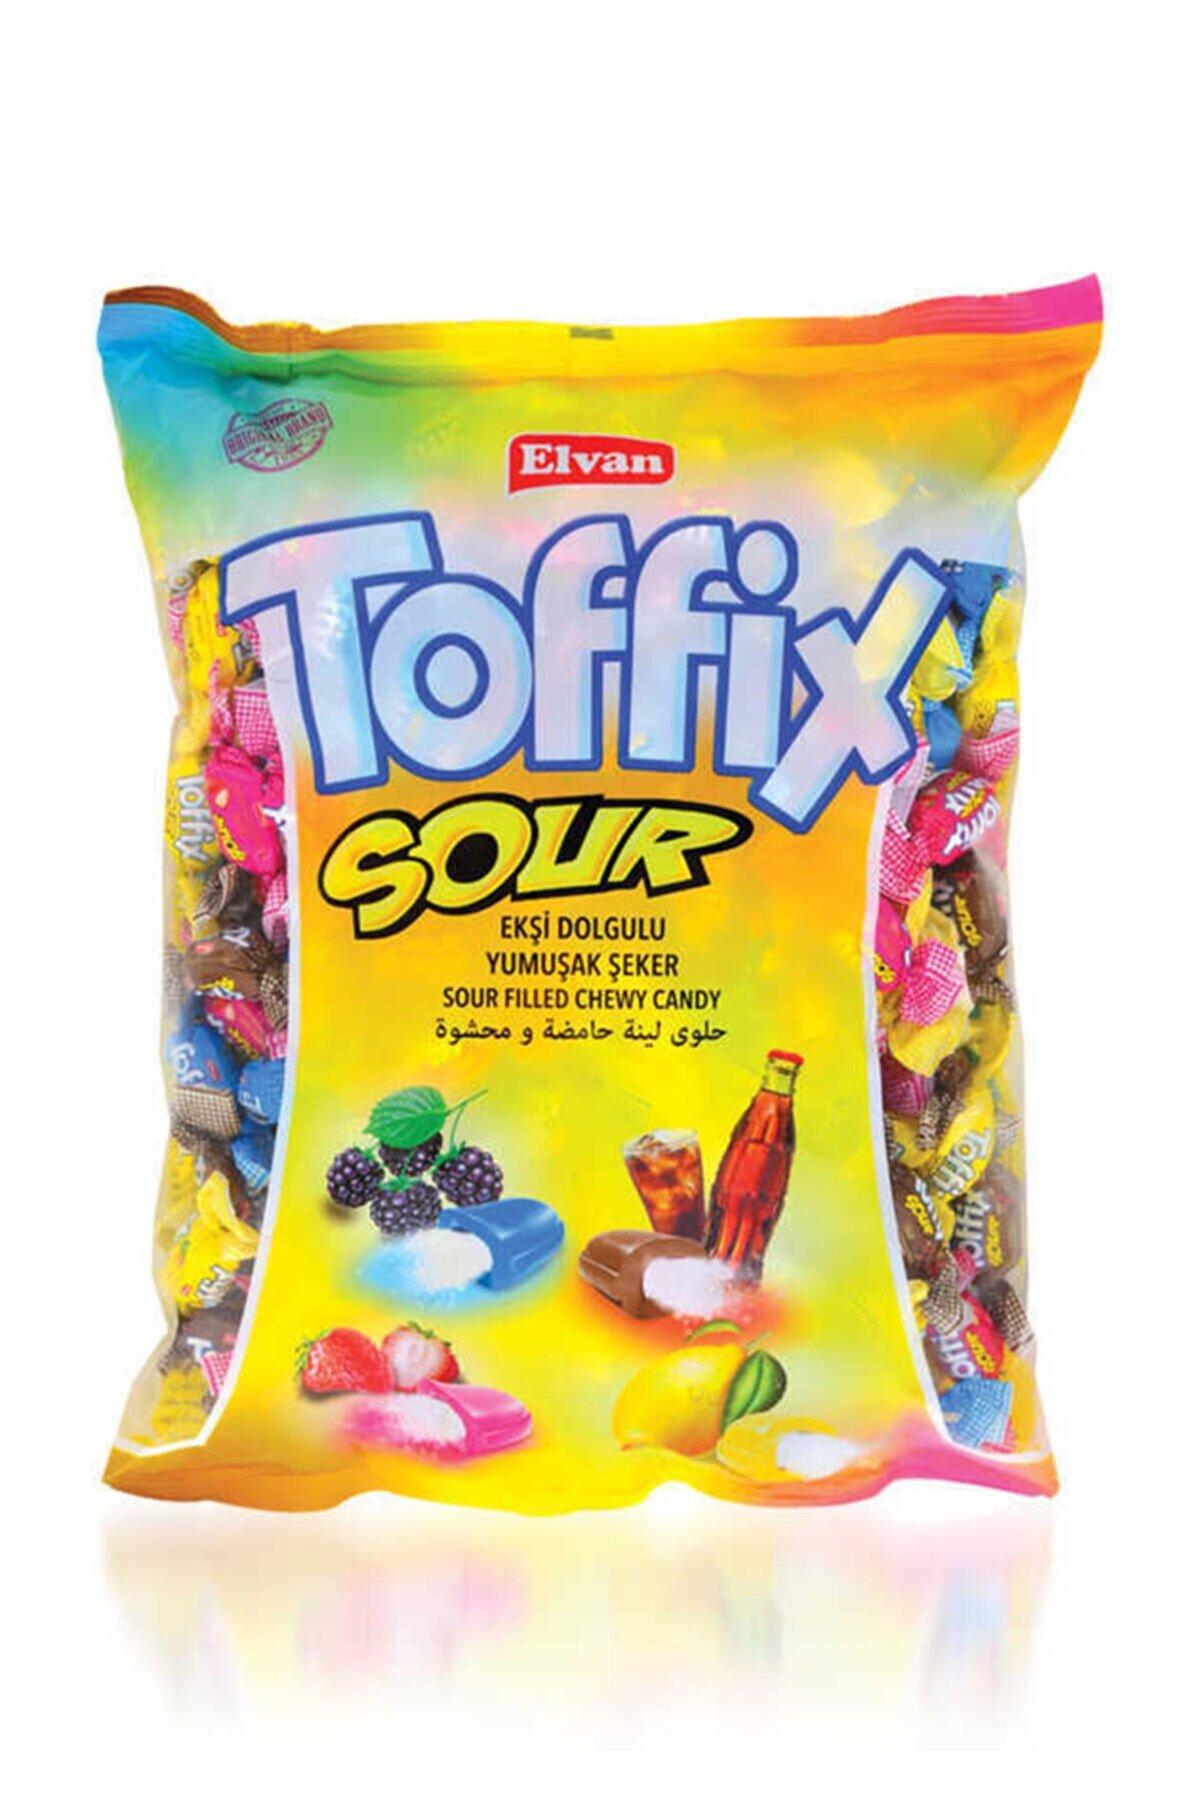 Elvan Toffix Sour Mix Şeker 1000 Gr. (1 Poşet)